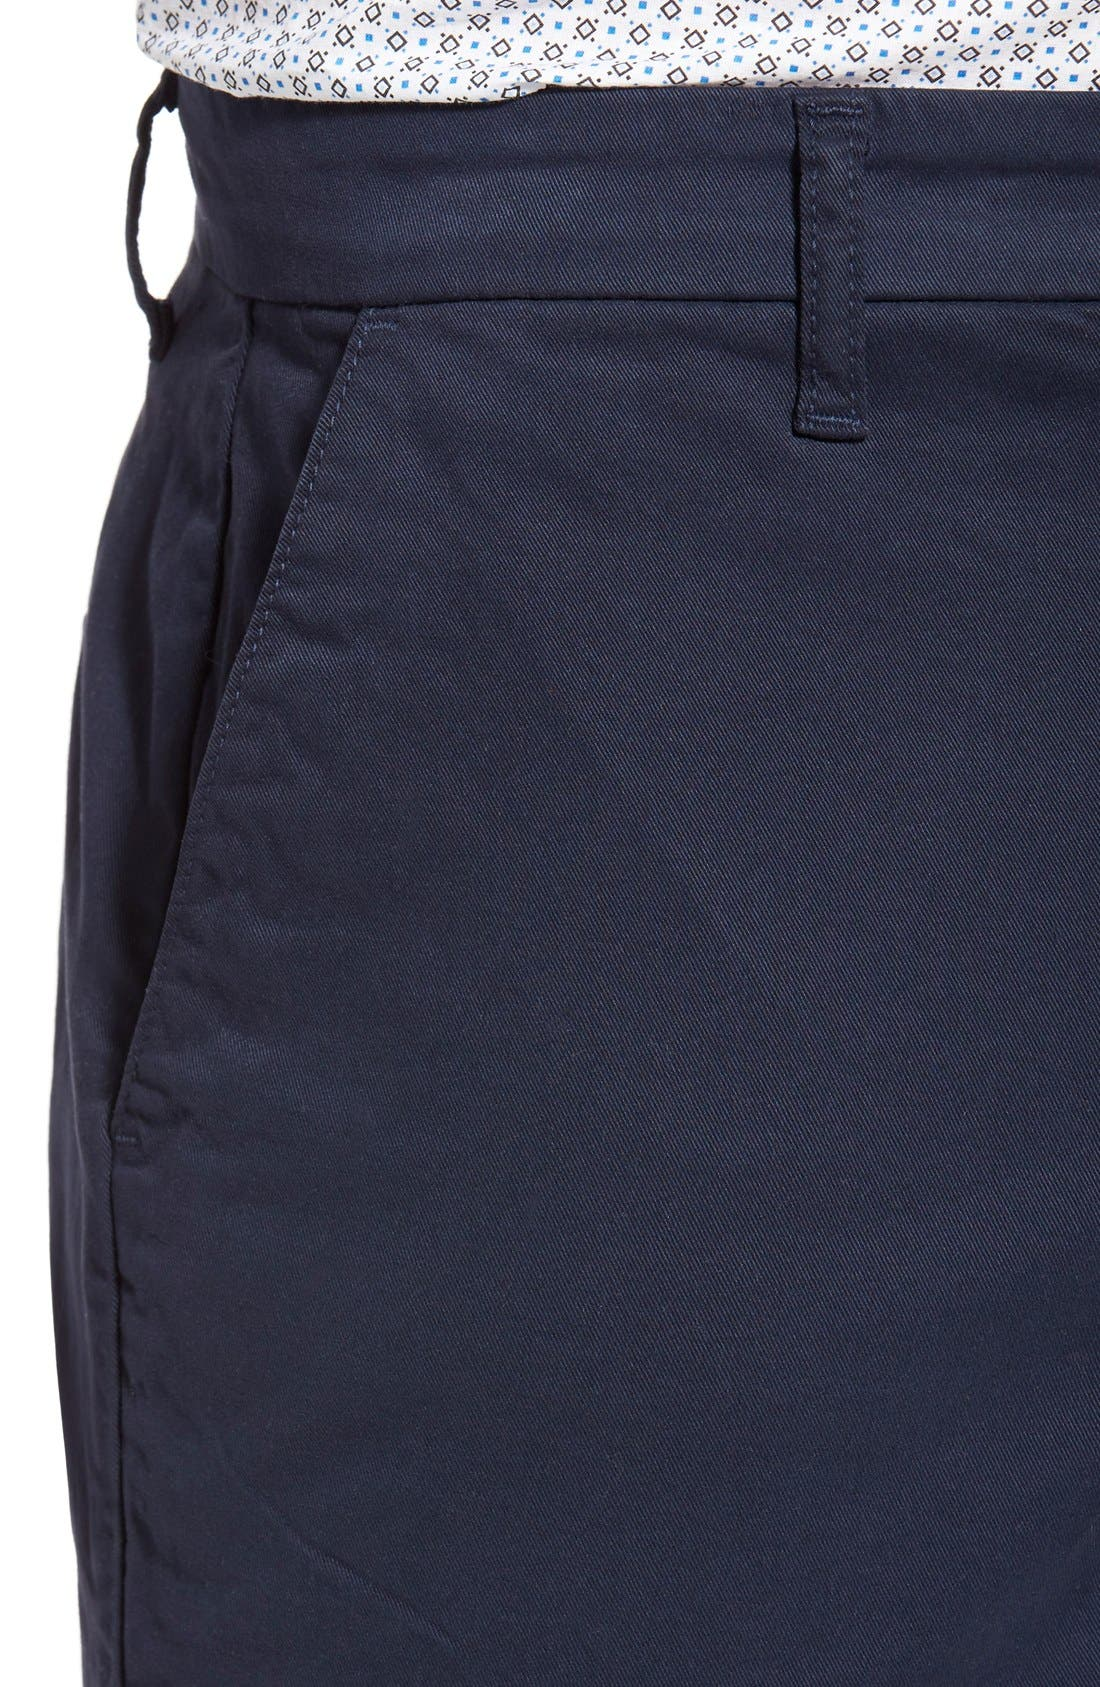 Alternate Image 4  - PAIGE 'Thompson' Slim Fit Shorts